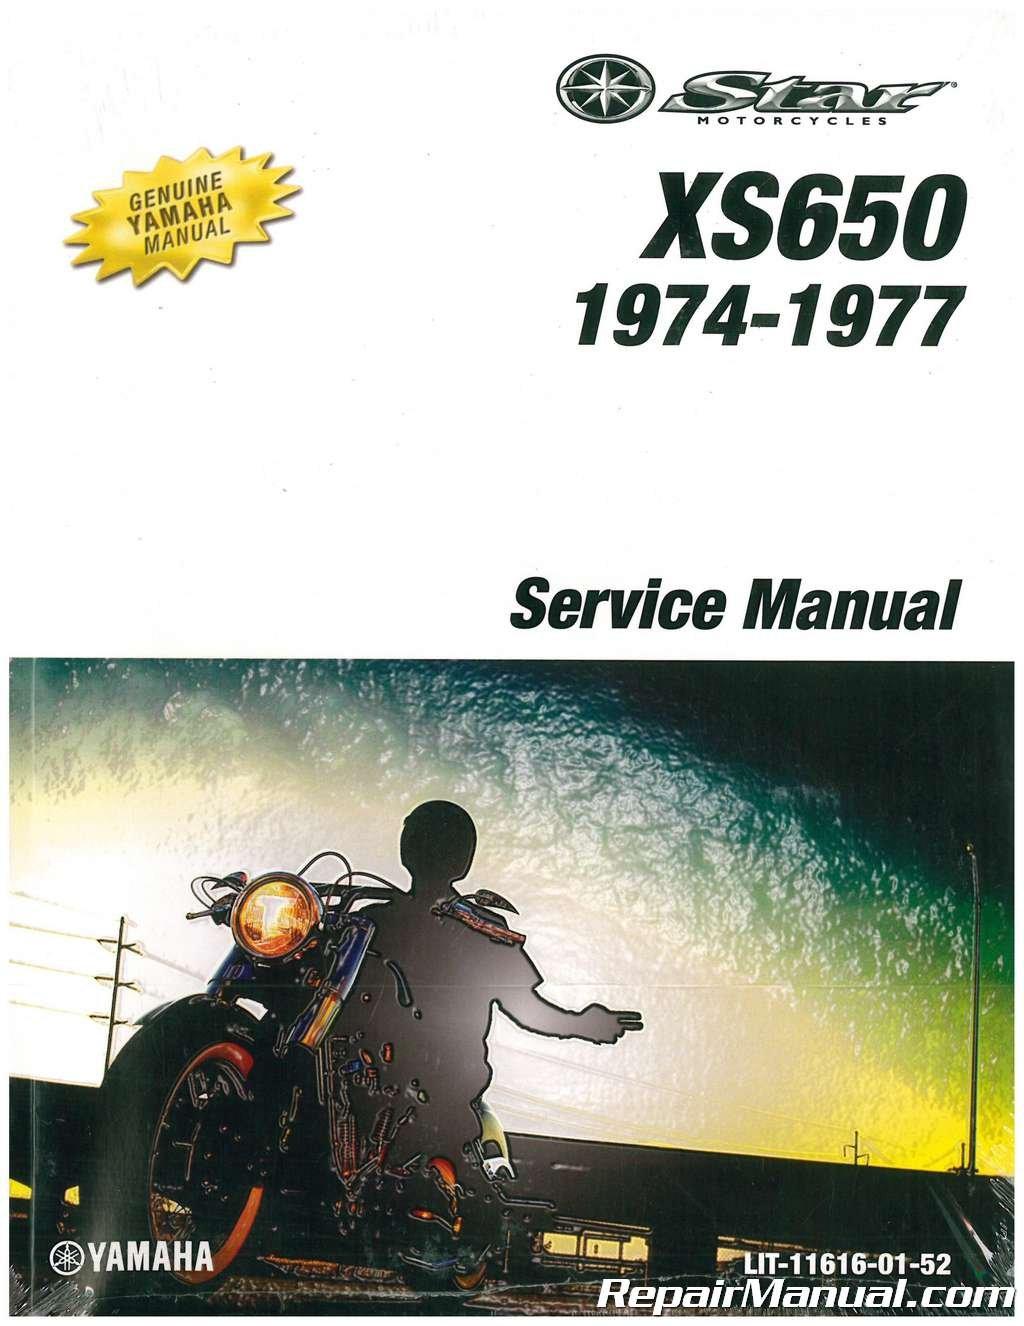 LIT-11616-01-52 1974-1977 Yamaha XS650 Motorcycle Service Manual:  Manufacturer: Amazon.com: Books